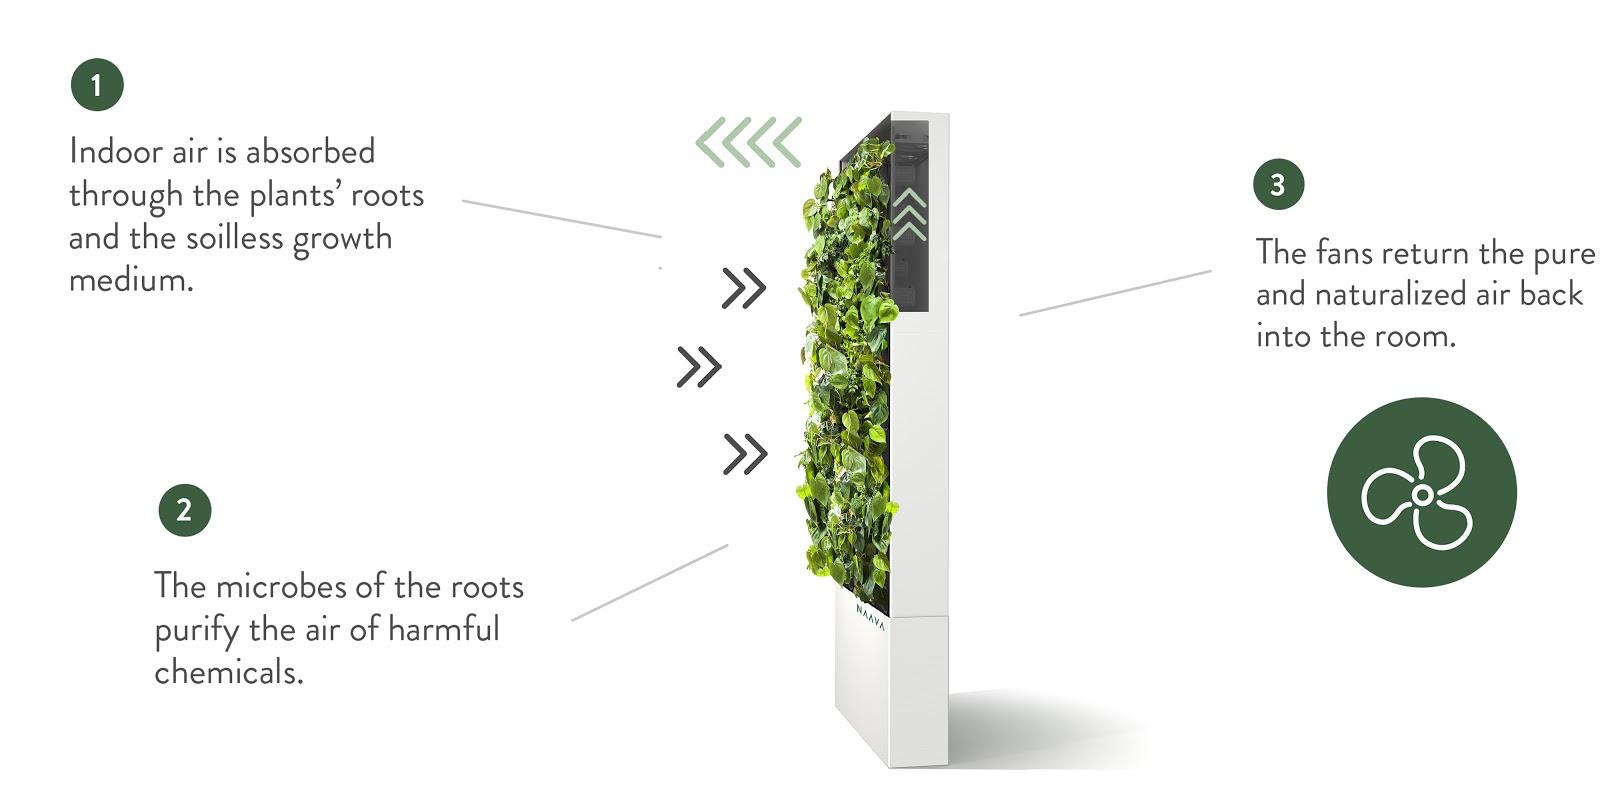 greenbuilding-img-4.jpg